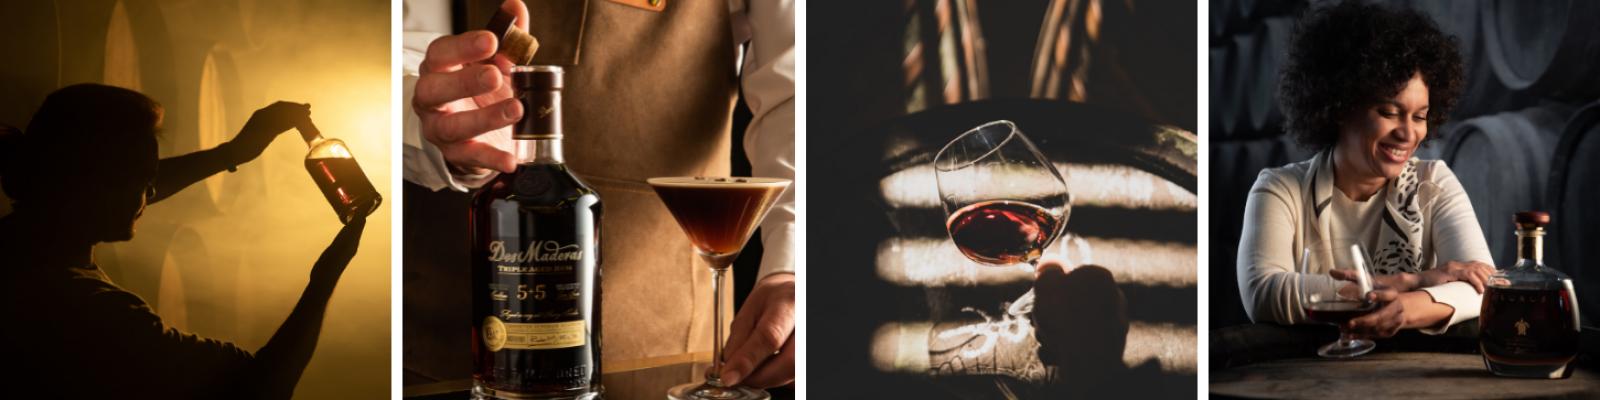 Dos Maderas Aged Rum Digital Strategy